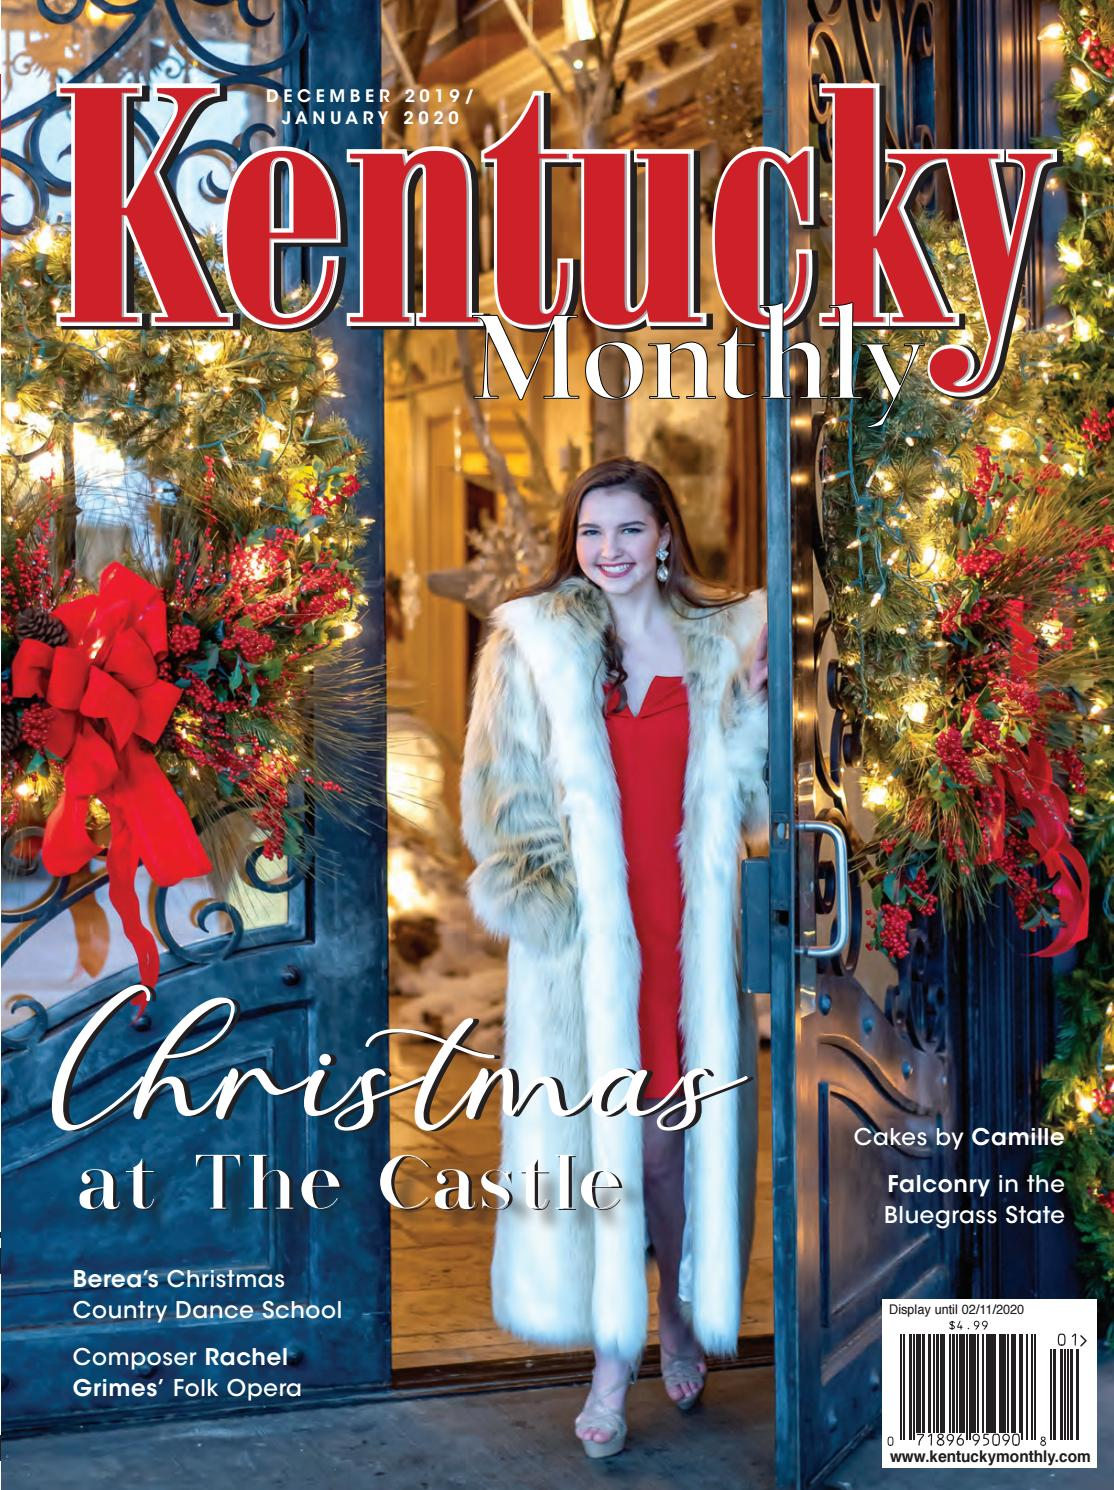 Burkesville, Ky Christmas Parade 2020 December 2019/January 2020 | Kentucky Monthly Magazine by Kentucky